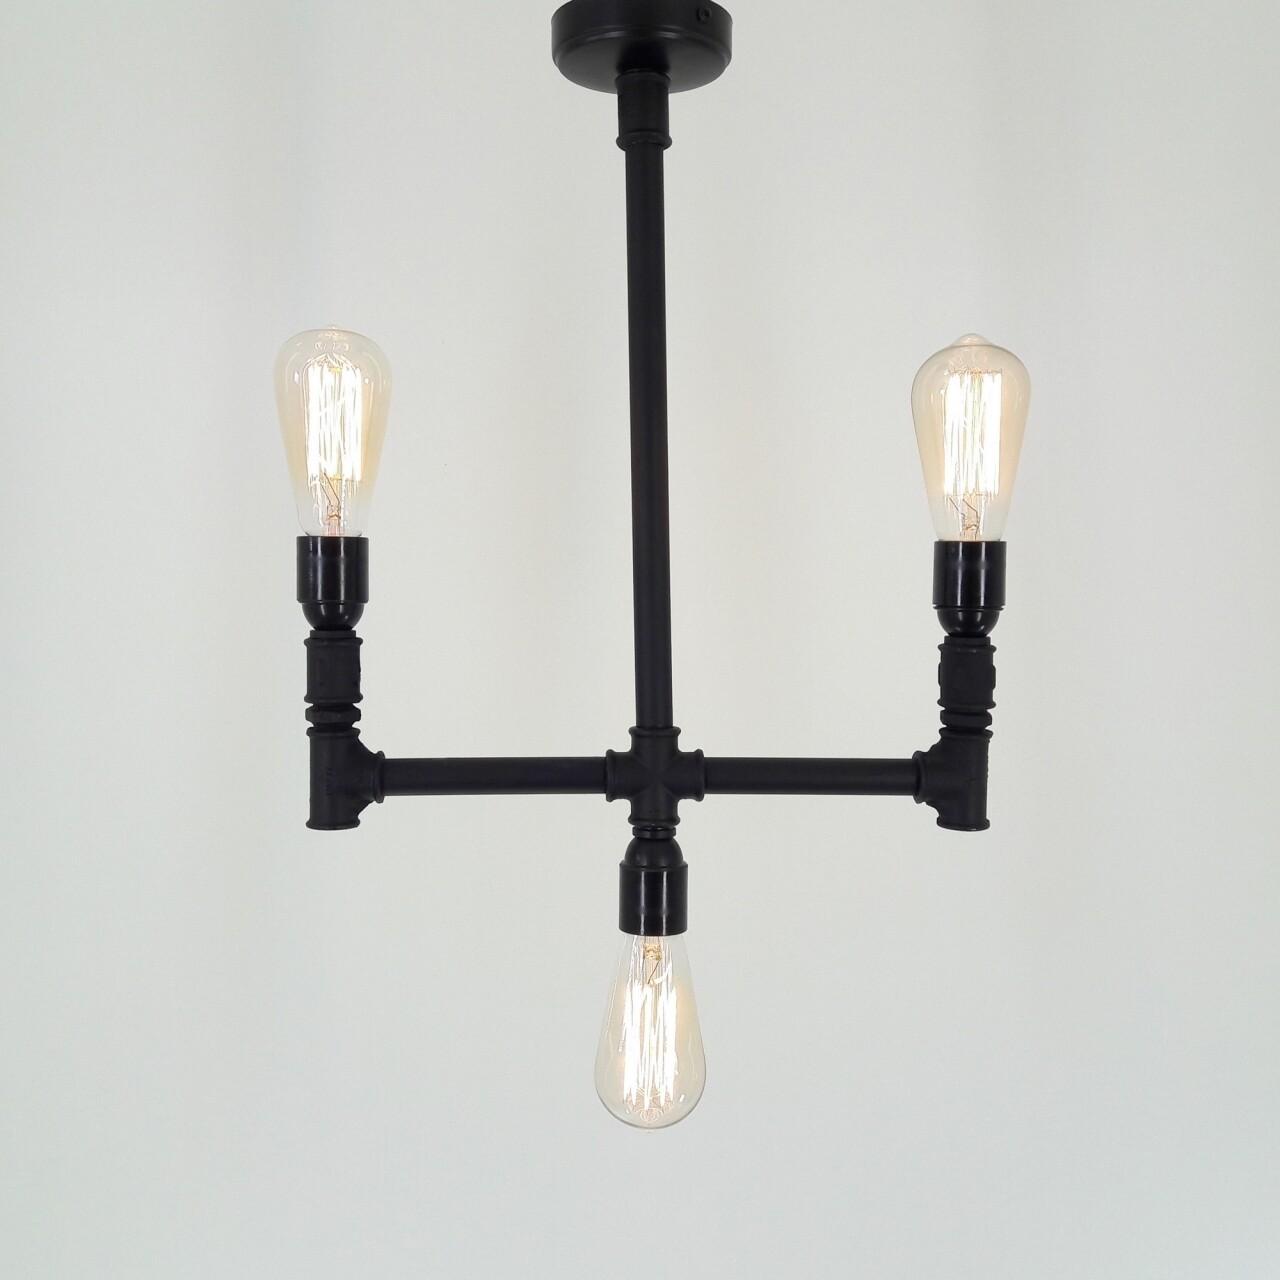 Candelabru Lalezar, All Design, metal, 55x40x65 cm, negru